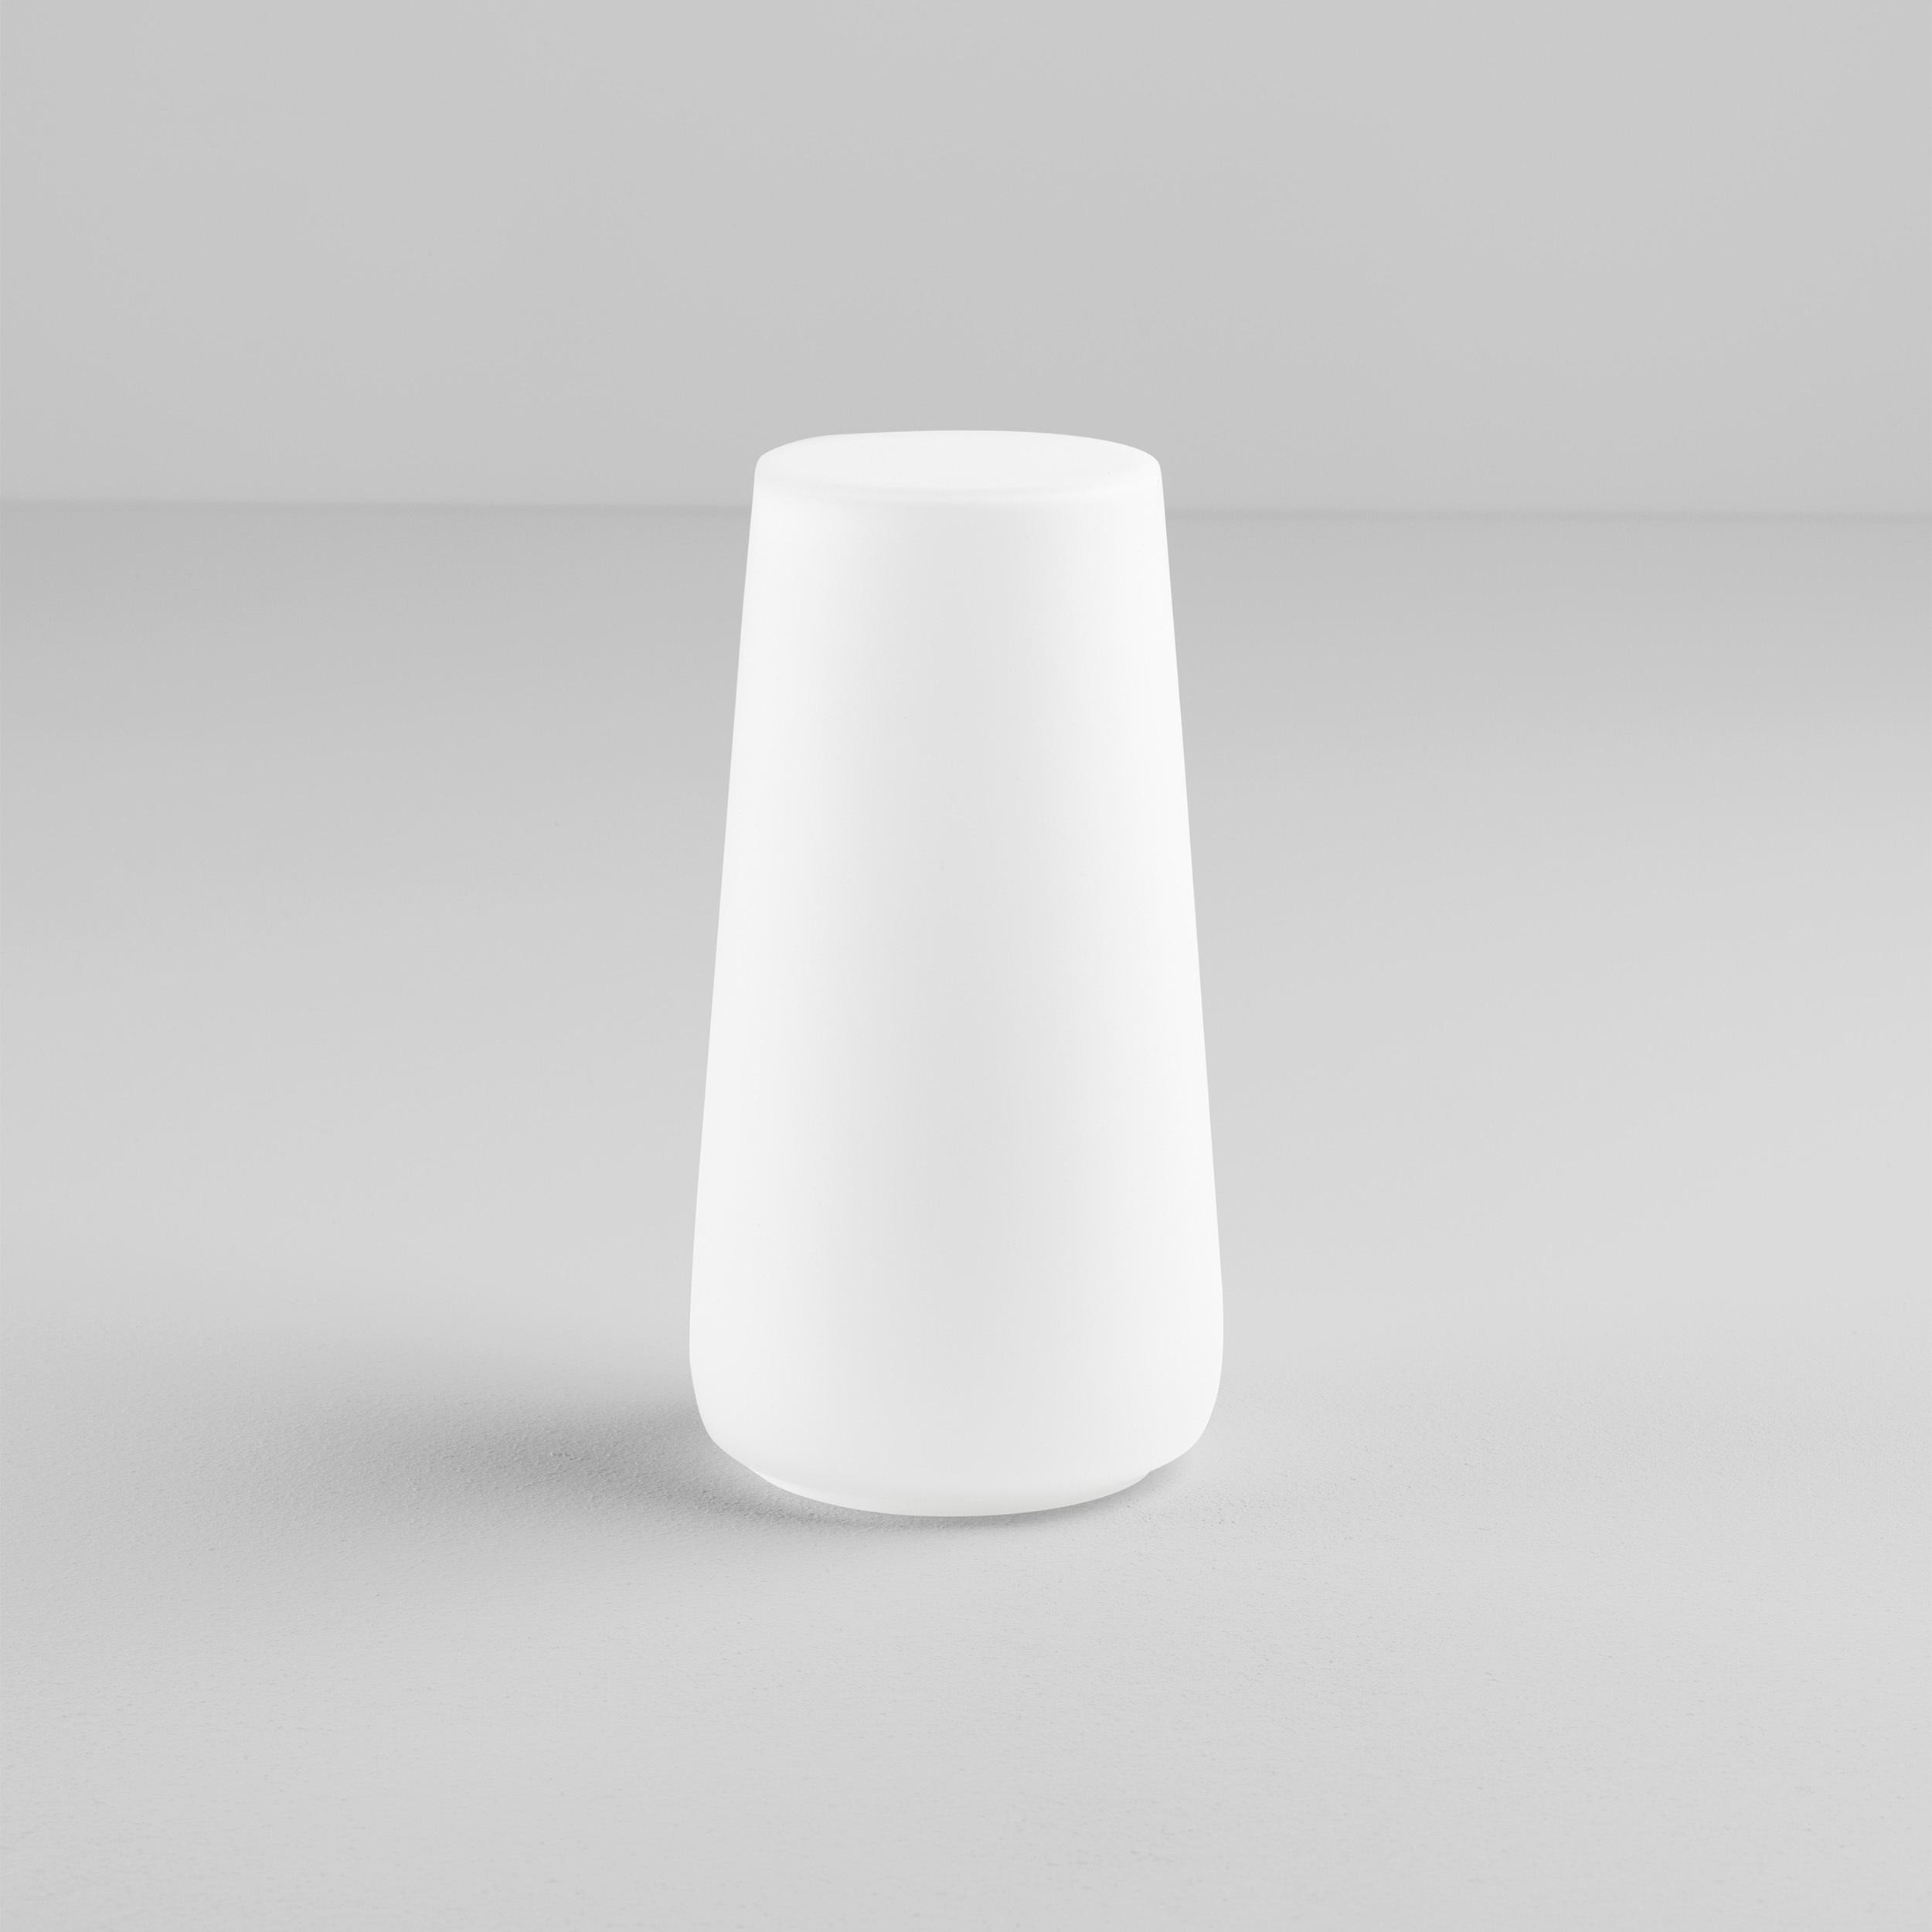 Плафон Astro Beauville Glass 5033005 (4186), белый, стекло - фото 1